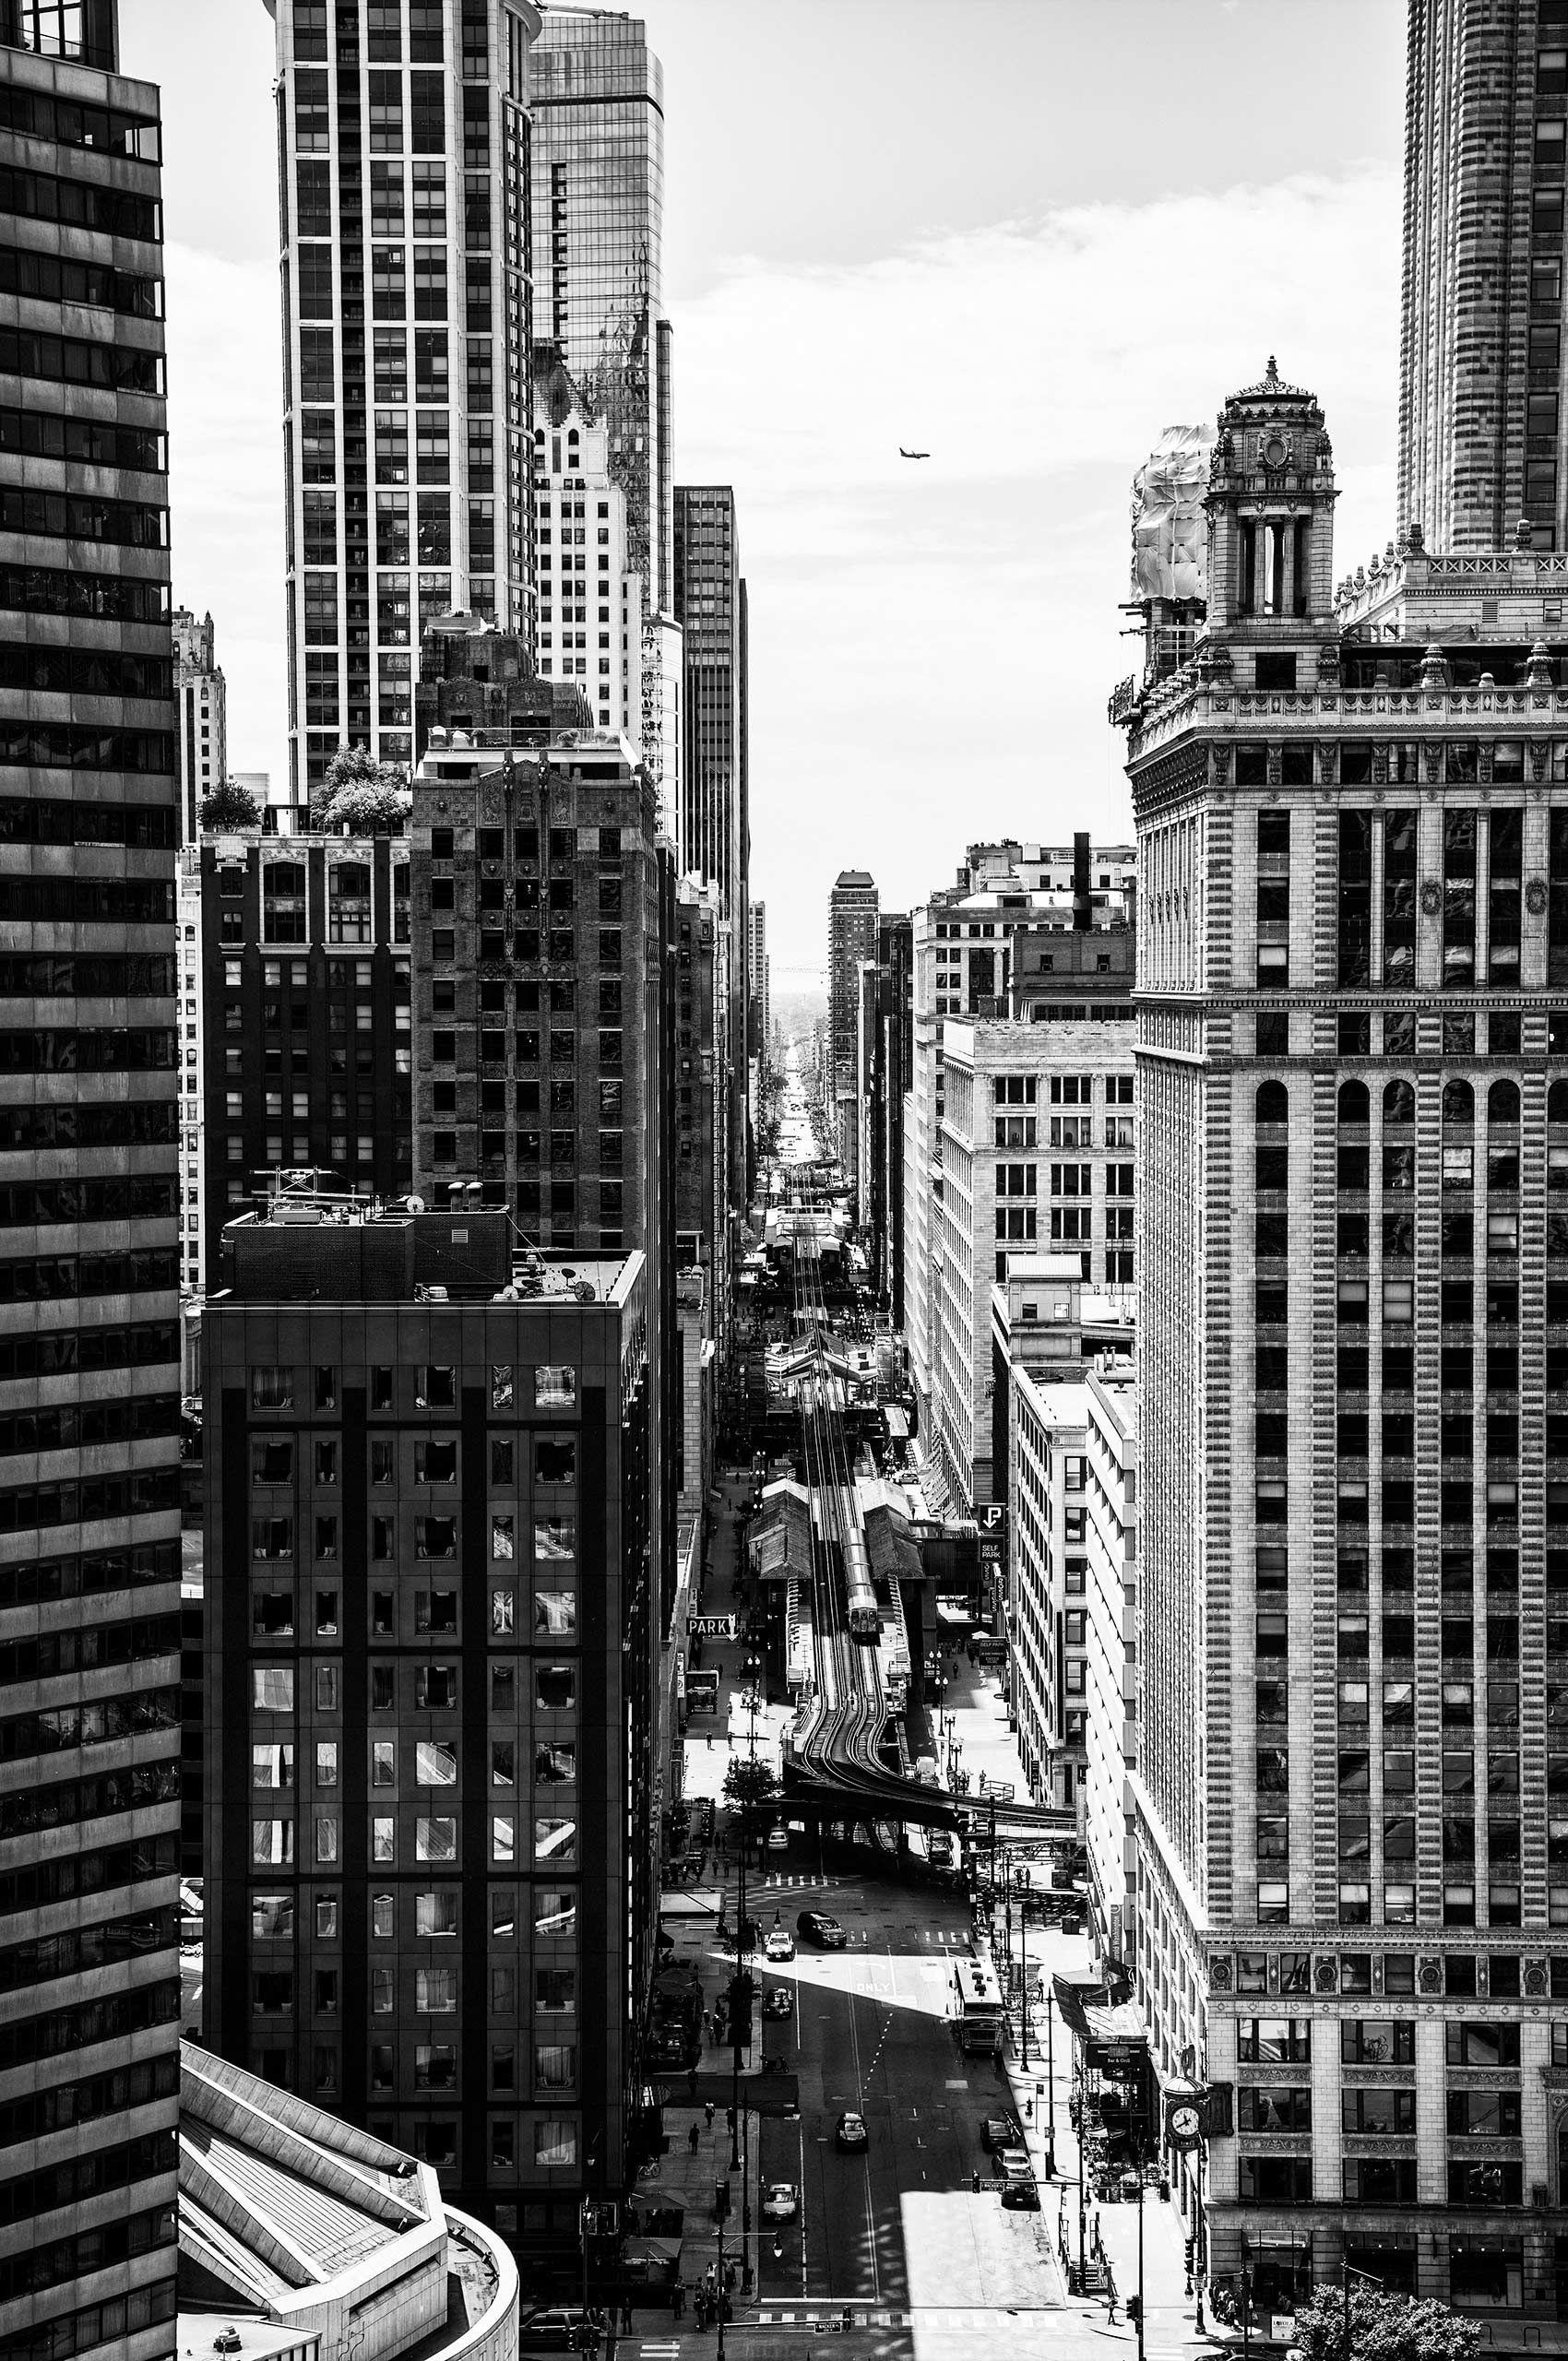 Metropolis-HenrikOlundPhotography.jpg